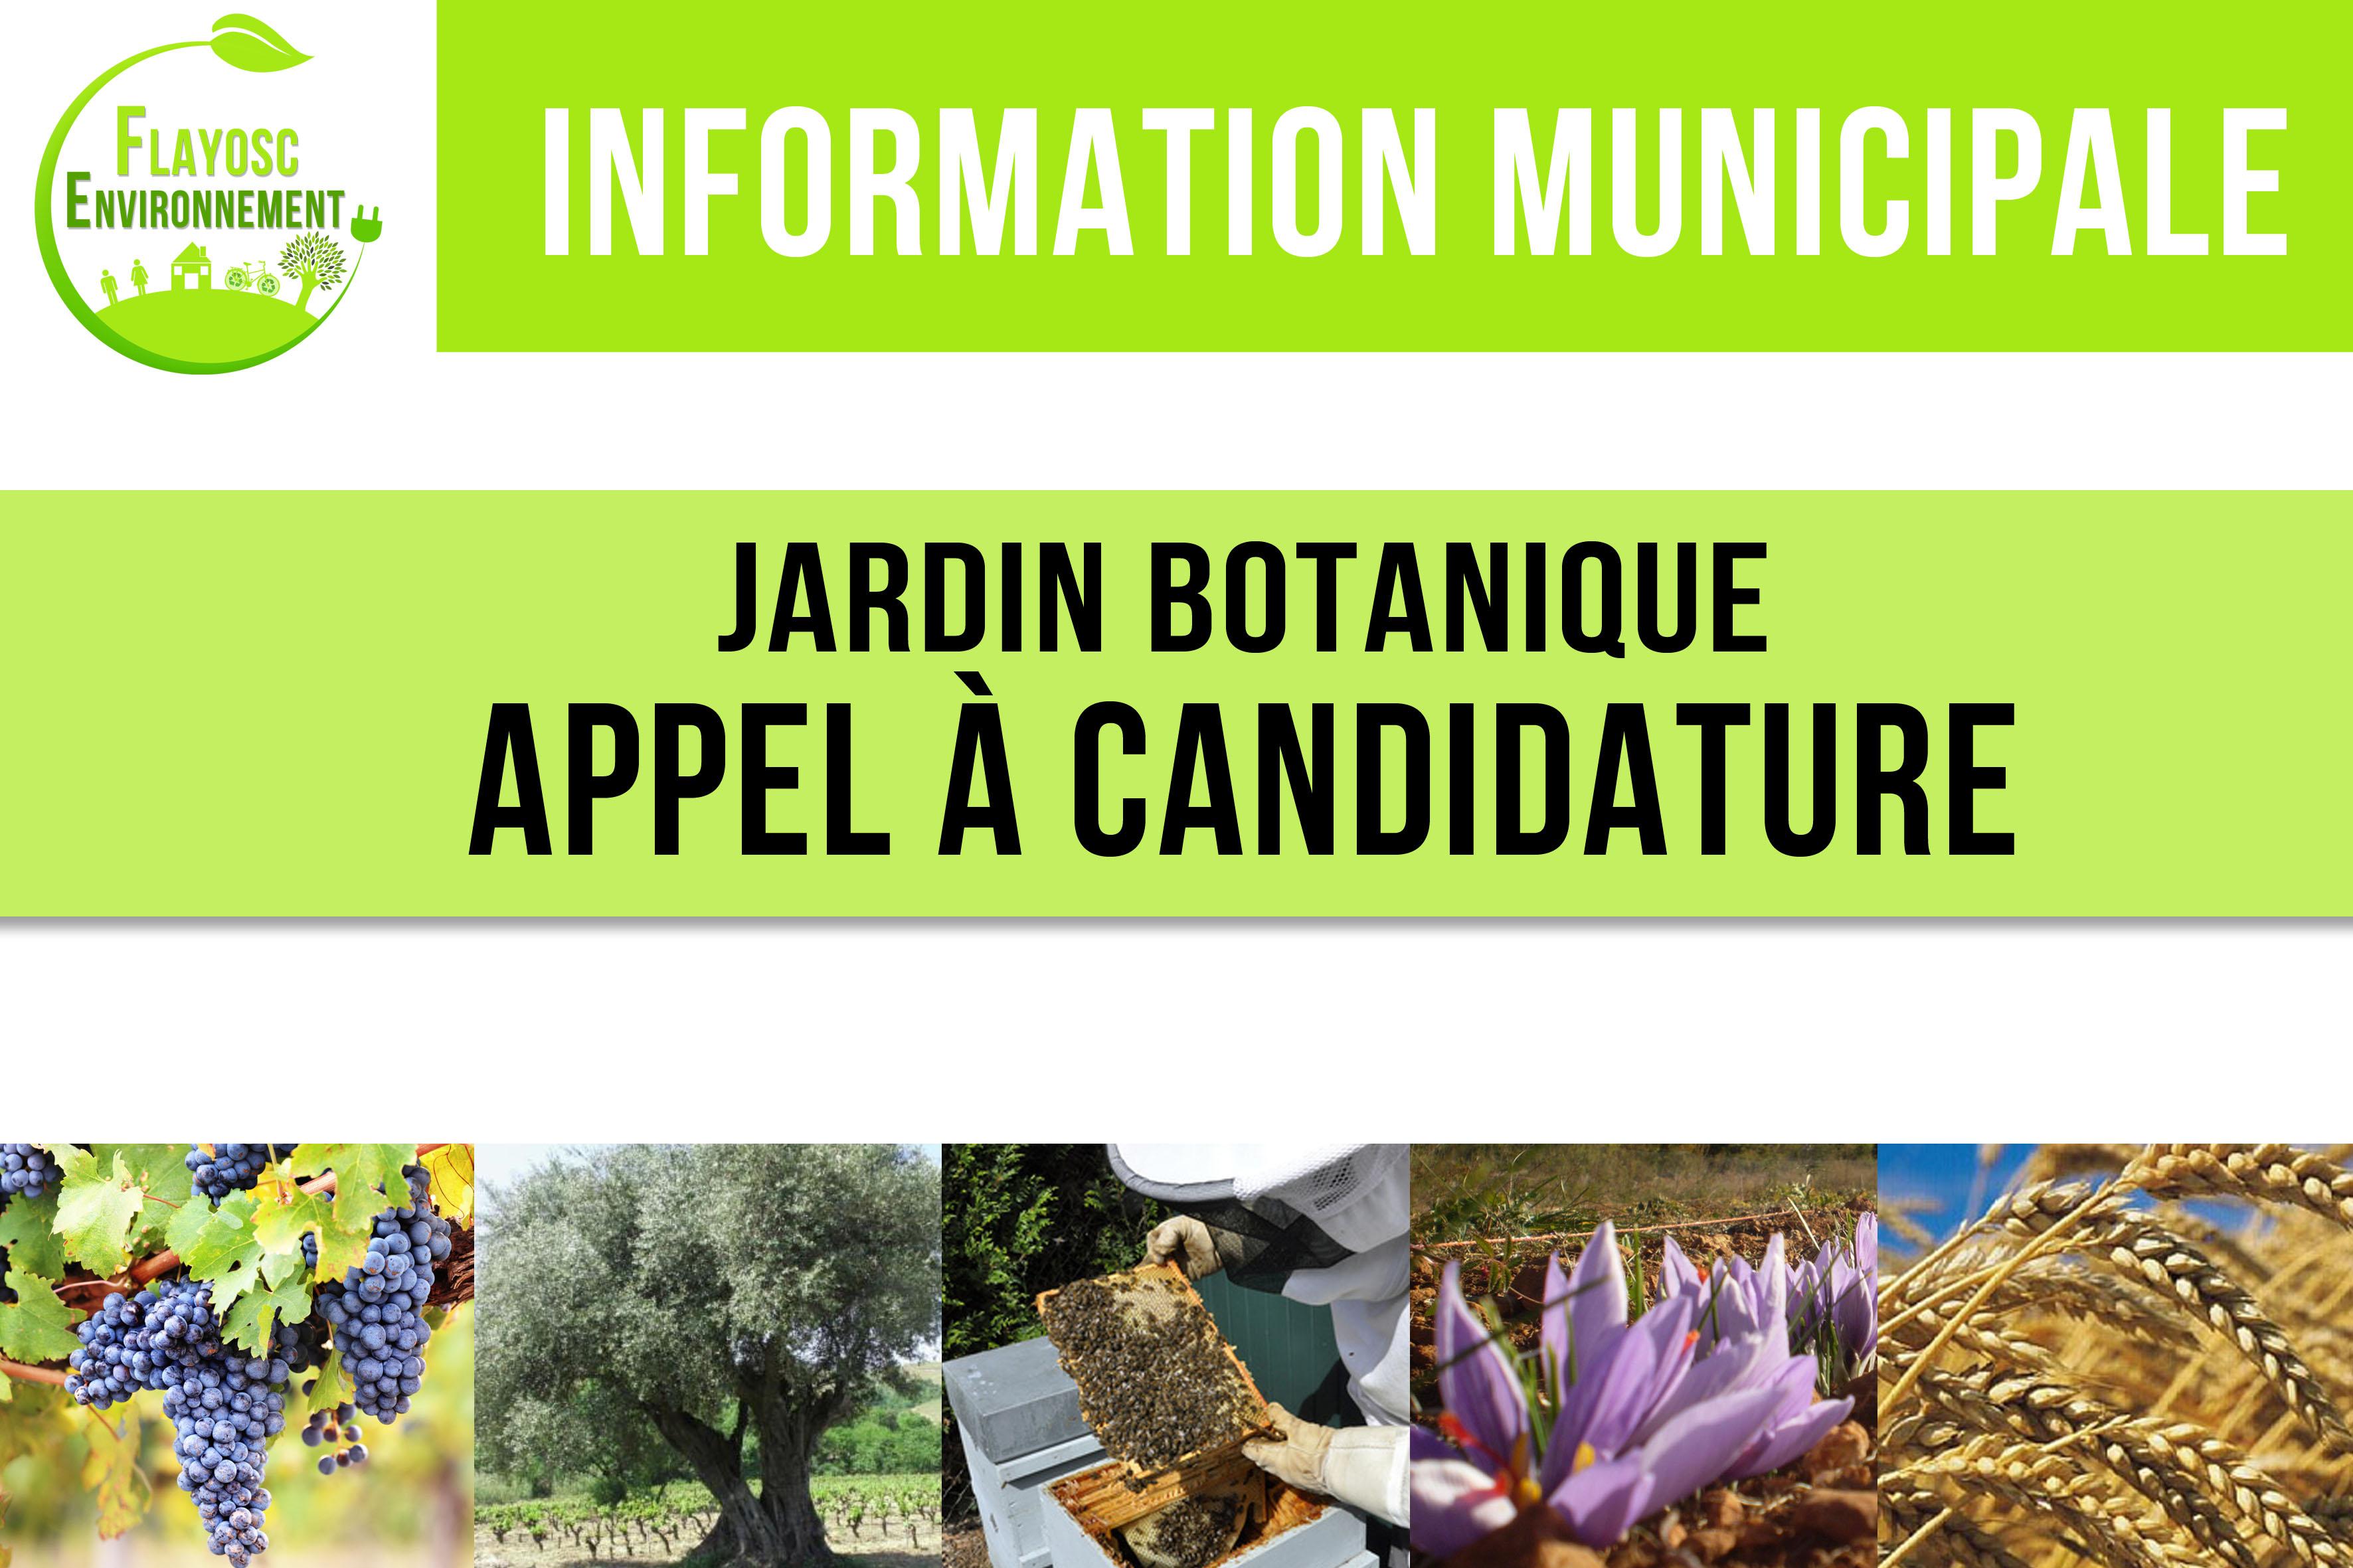 Appel candidature jardin botanique ville de flayosc for Jardin botanique noel 2015